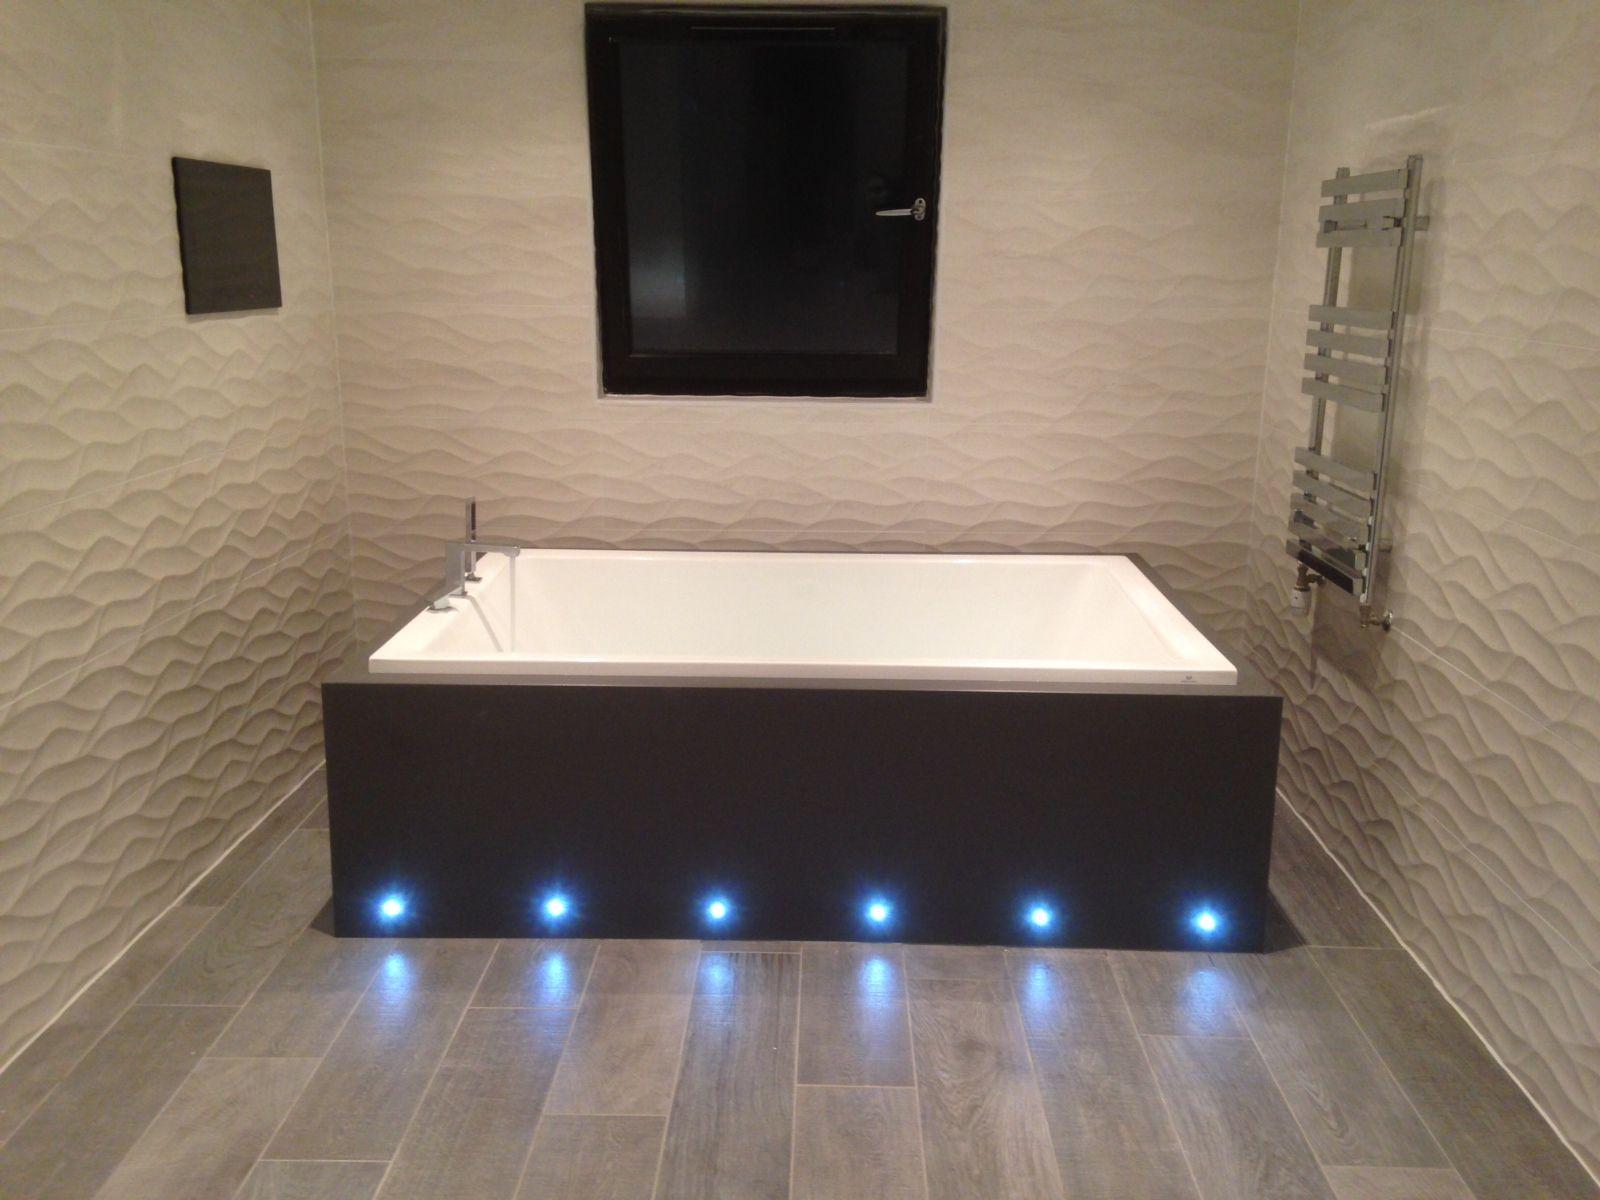 bath with lights - Google Search | Small bathroom ideas | Pinterest ...